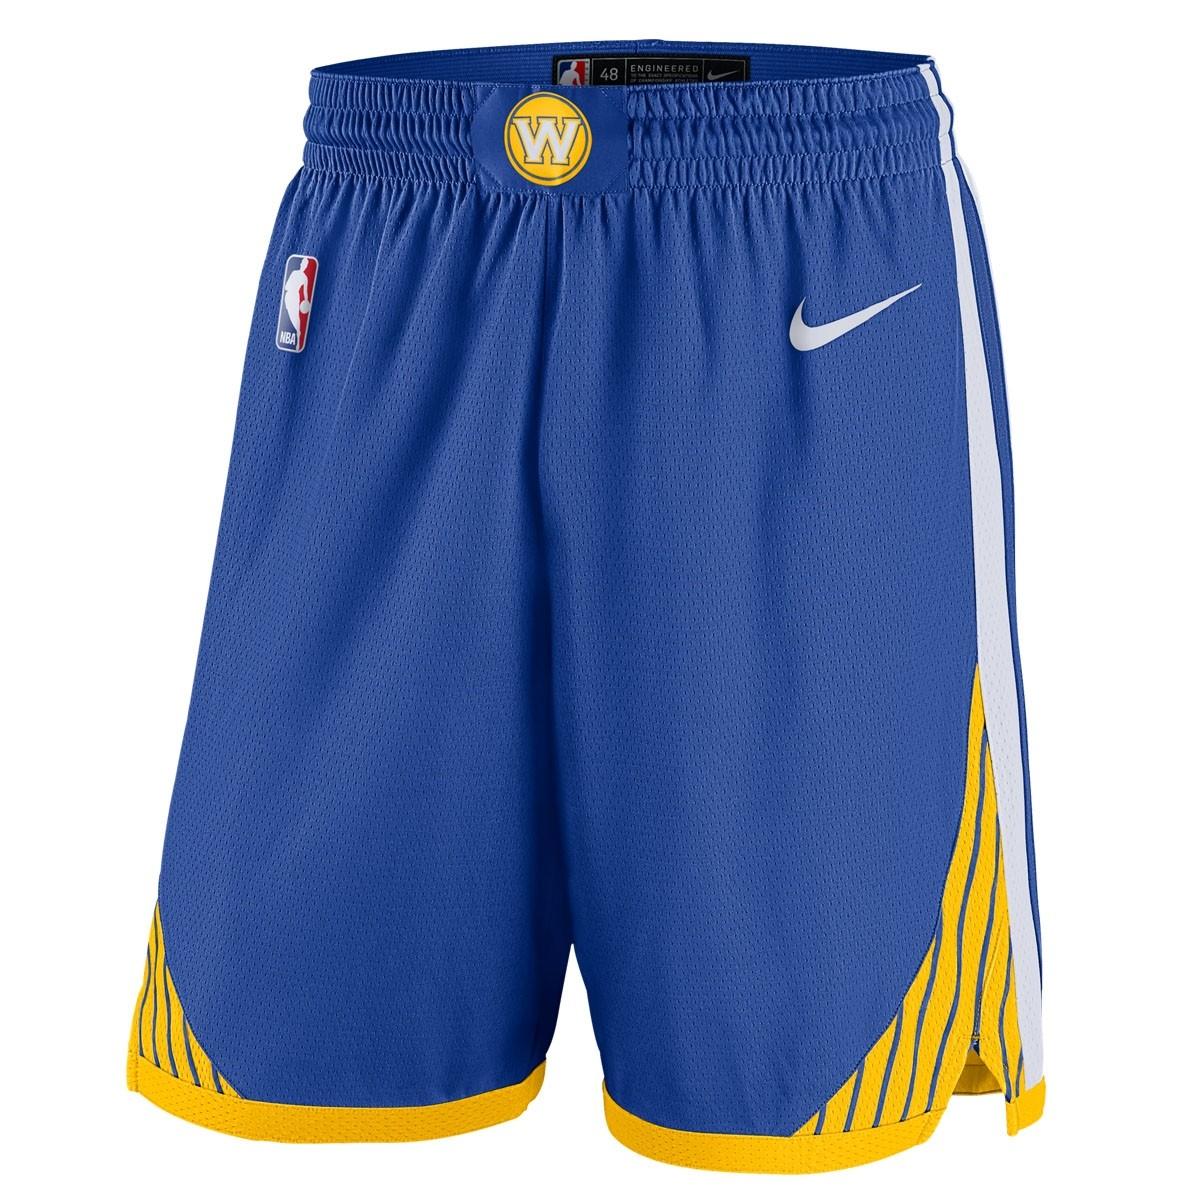 Nike NBA Warriors Swingman Short 18/19 'Icon Edition'